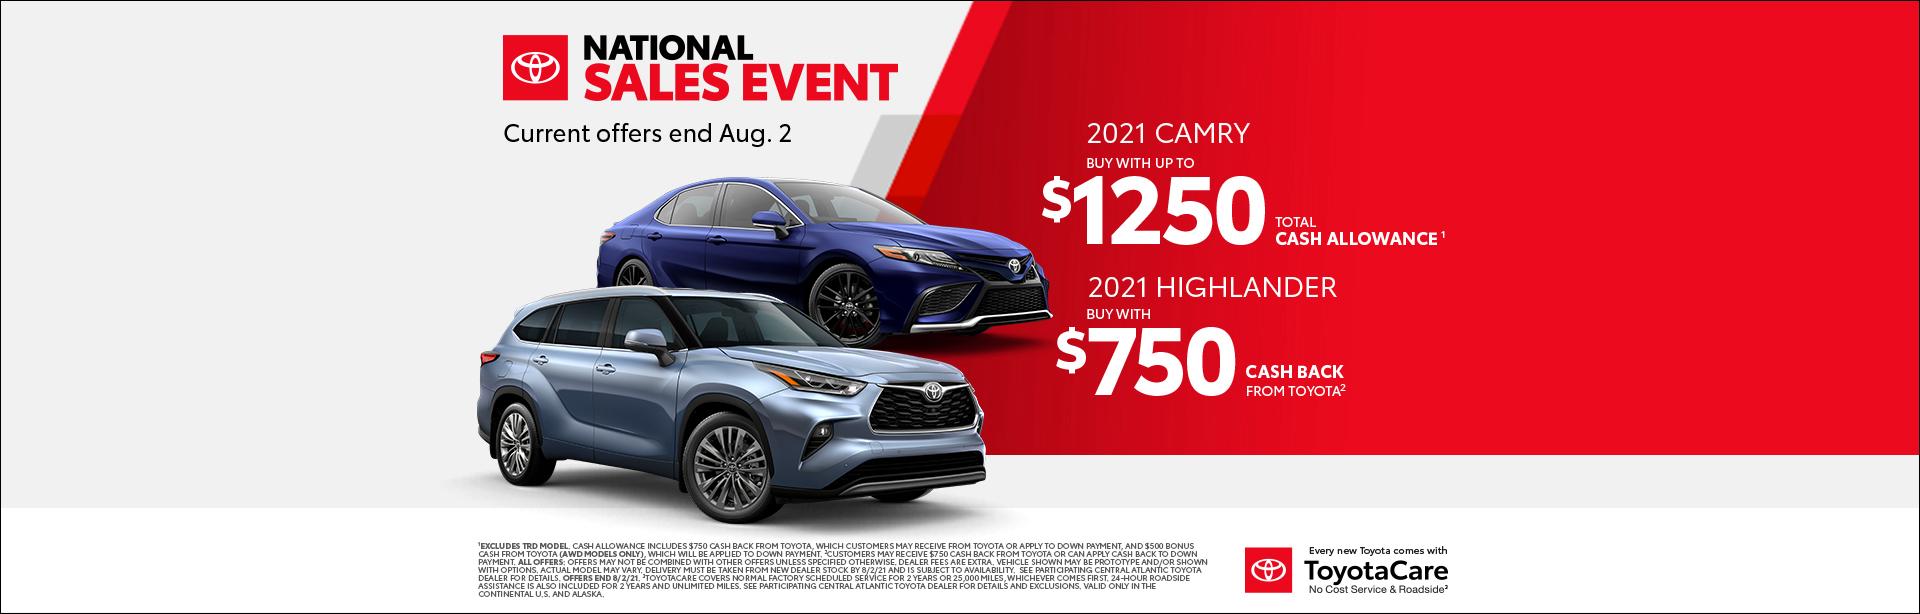 07-21_01_Central-Atlantic-Toyota-July-2021-CAT-National-Sales_1920x614_74ea_Camry-Highlander_R_xta.jpeg